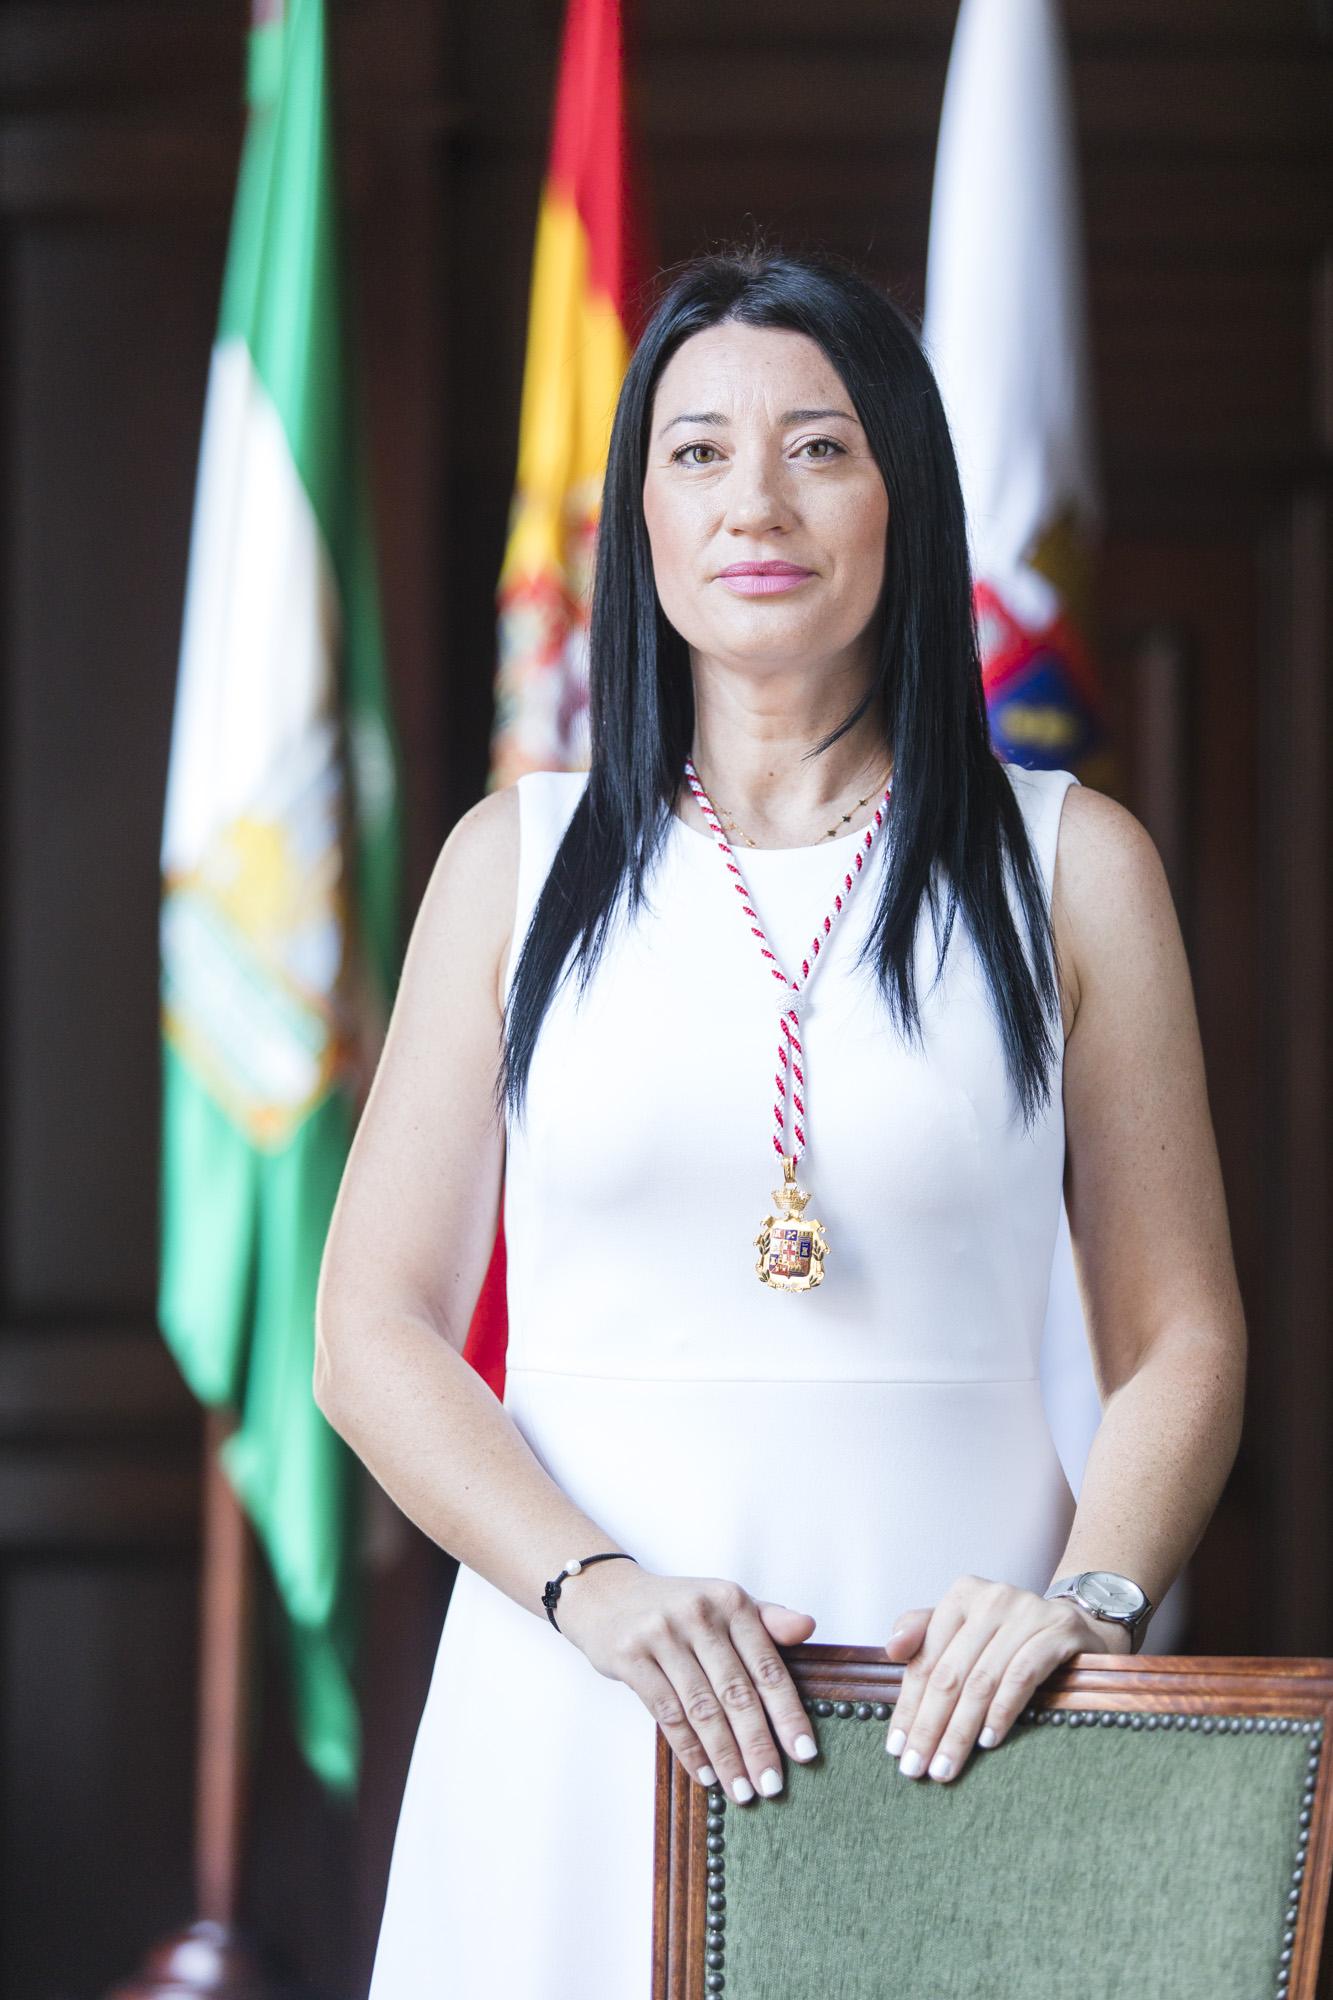 Anabel Mateos Sánchez